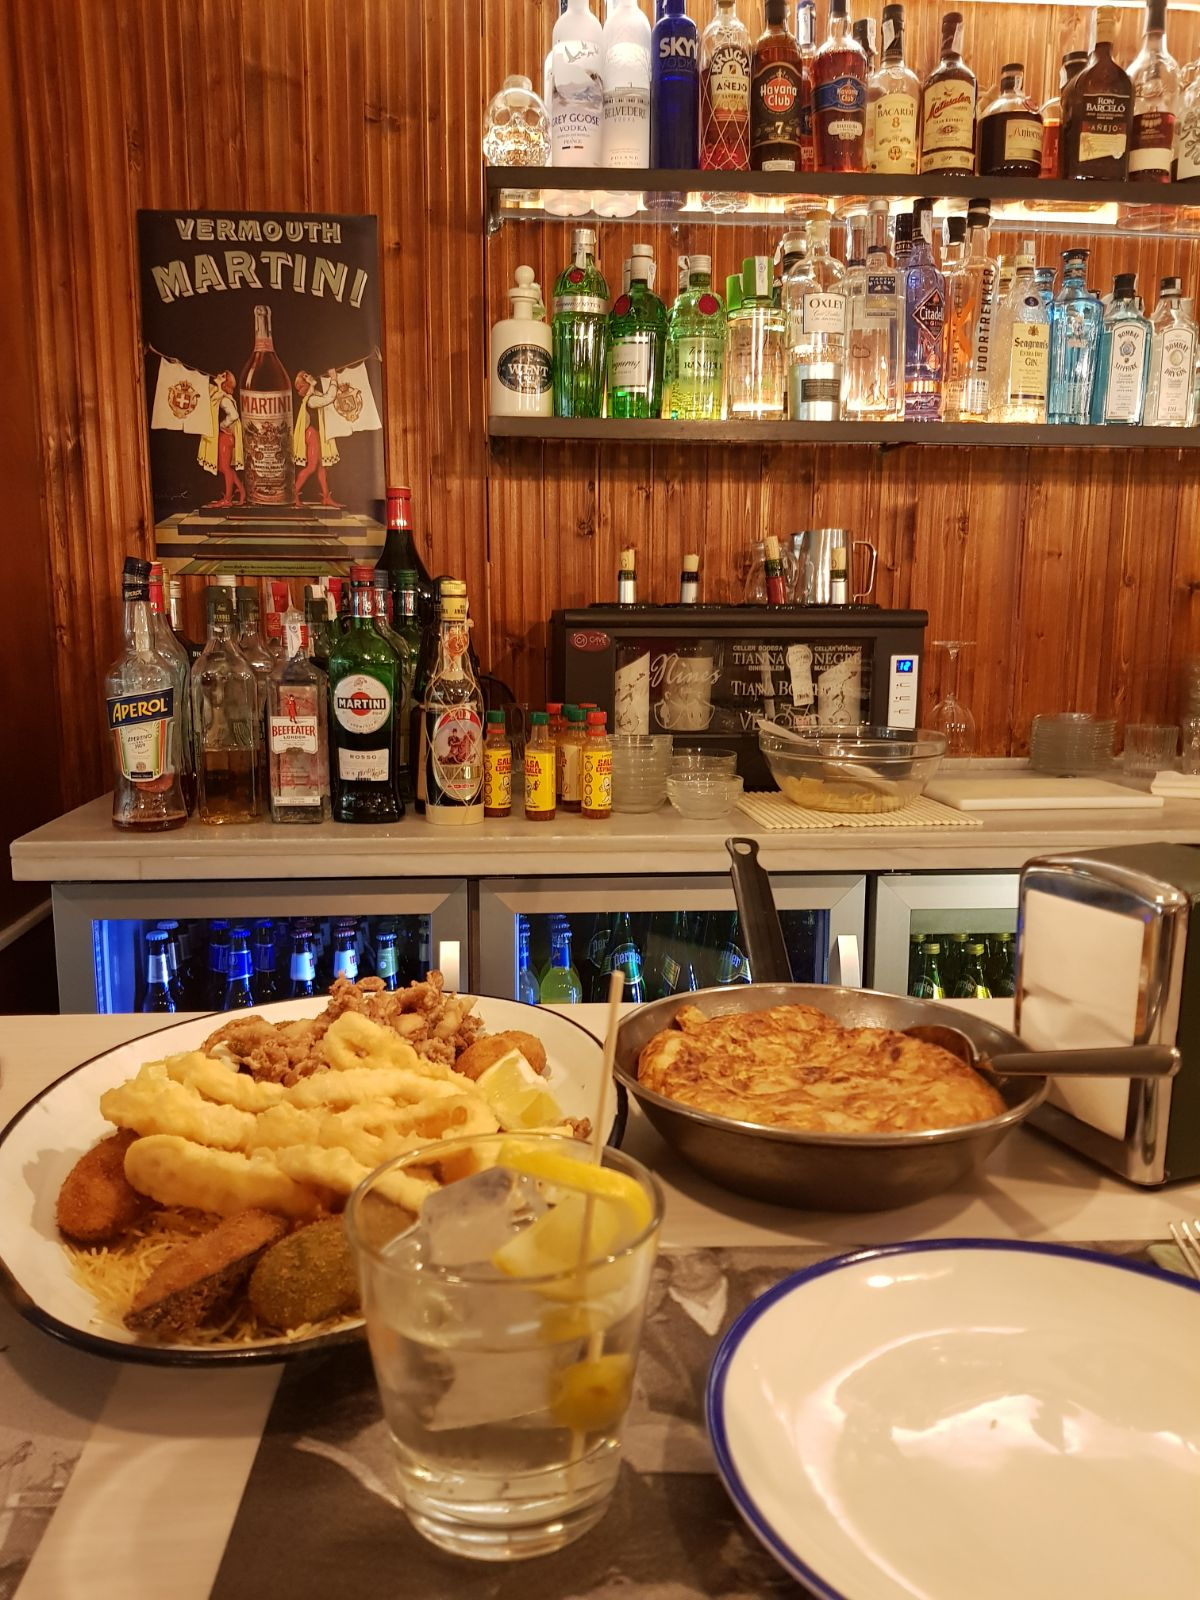 palma-mallorca-bonnes-adresses-restaurant-vermuteria-la-rosa-nourriture